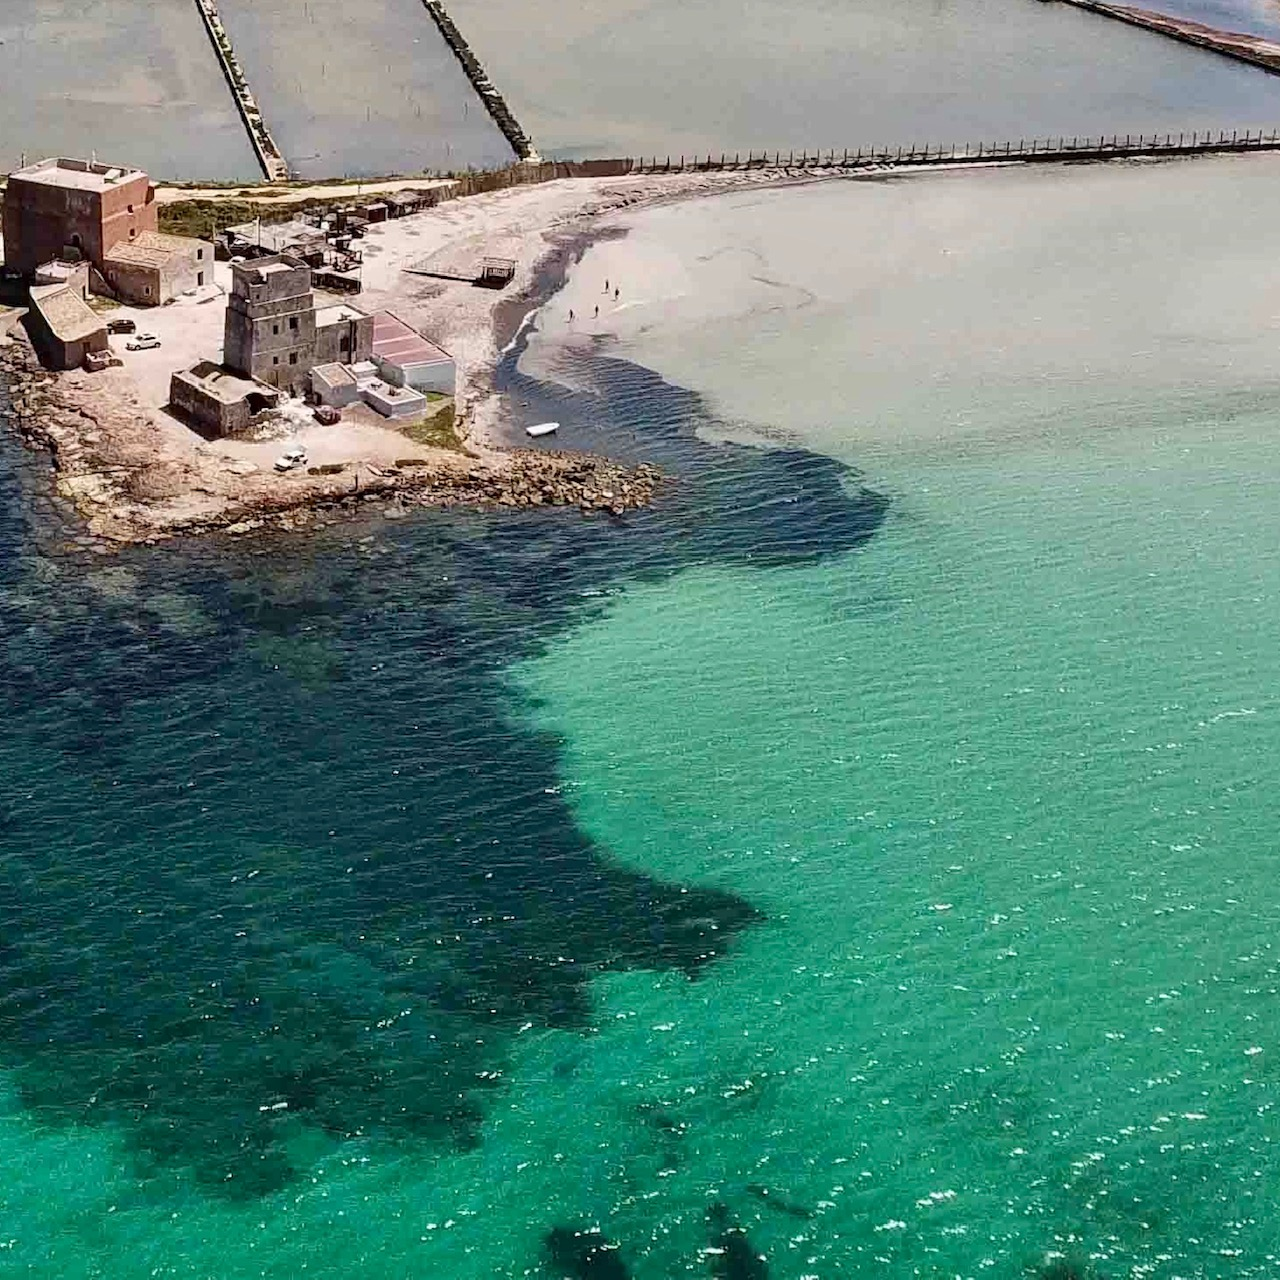 lostagnone bay, lo stagnone kite spot, san teodoro